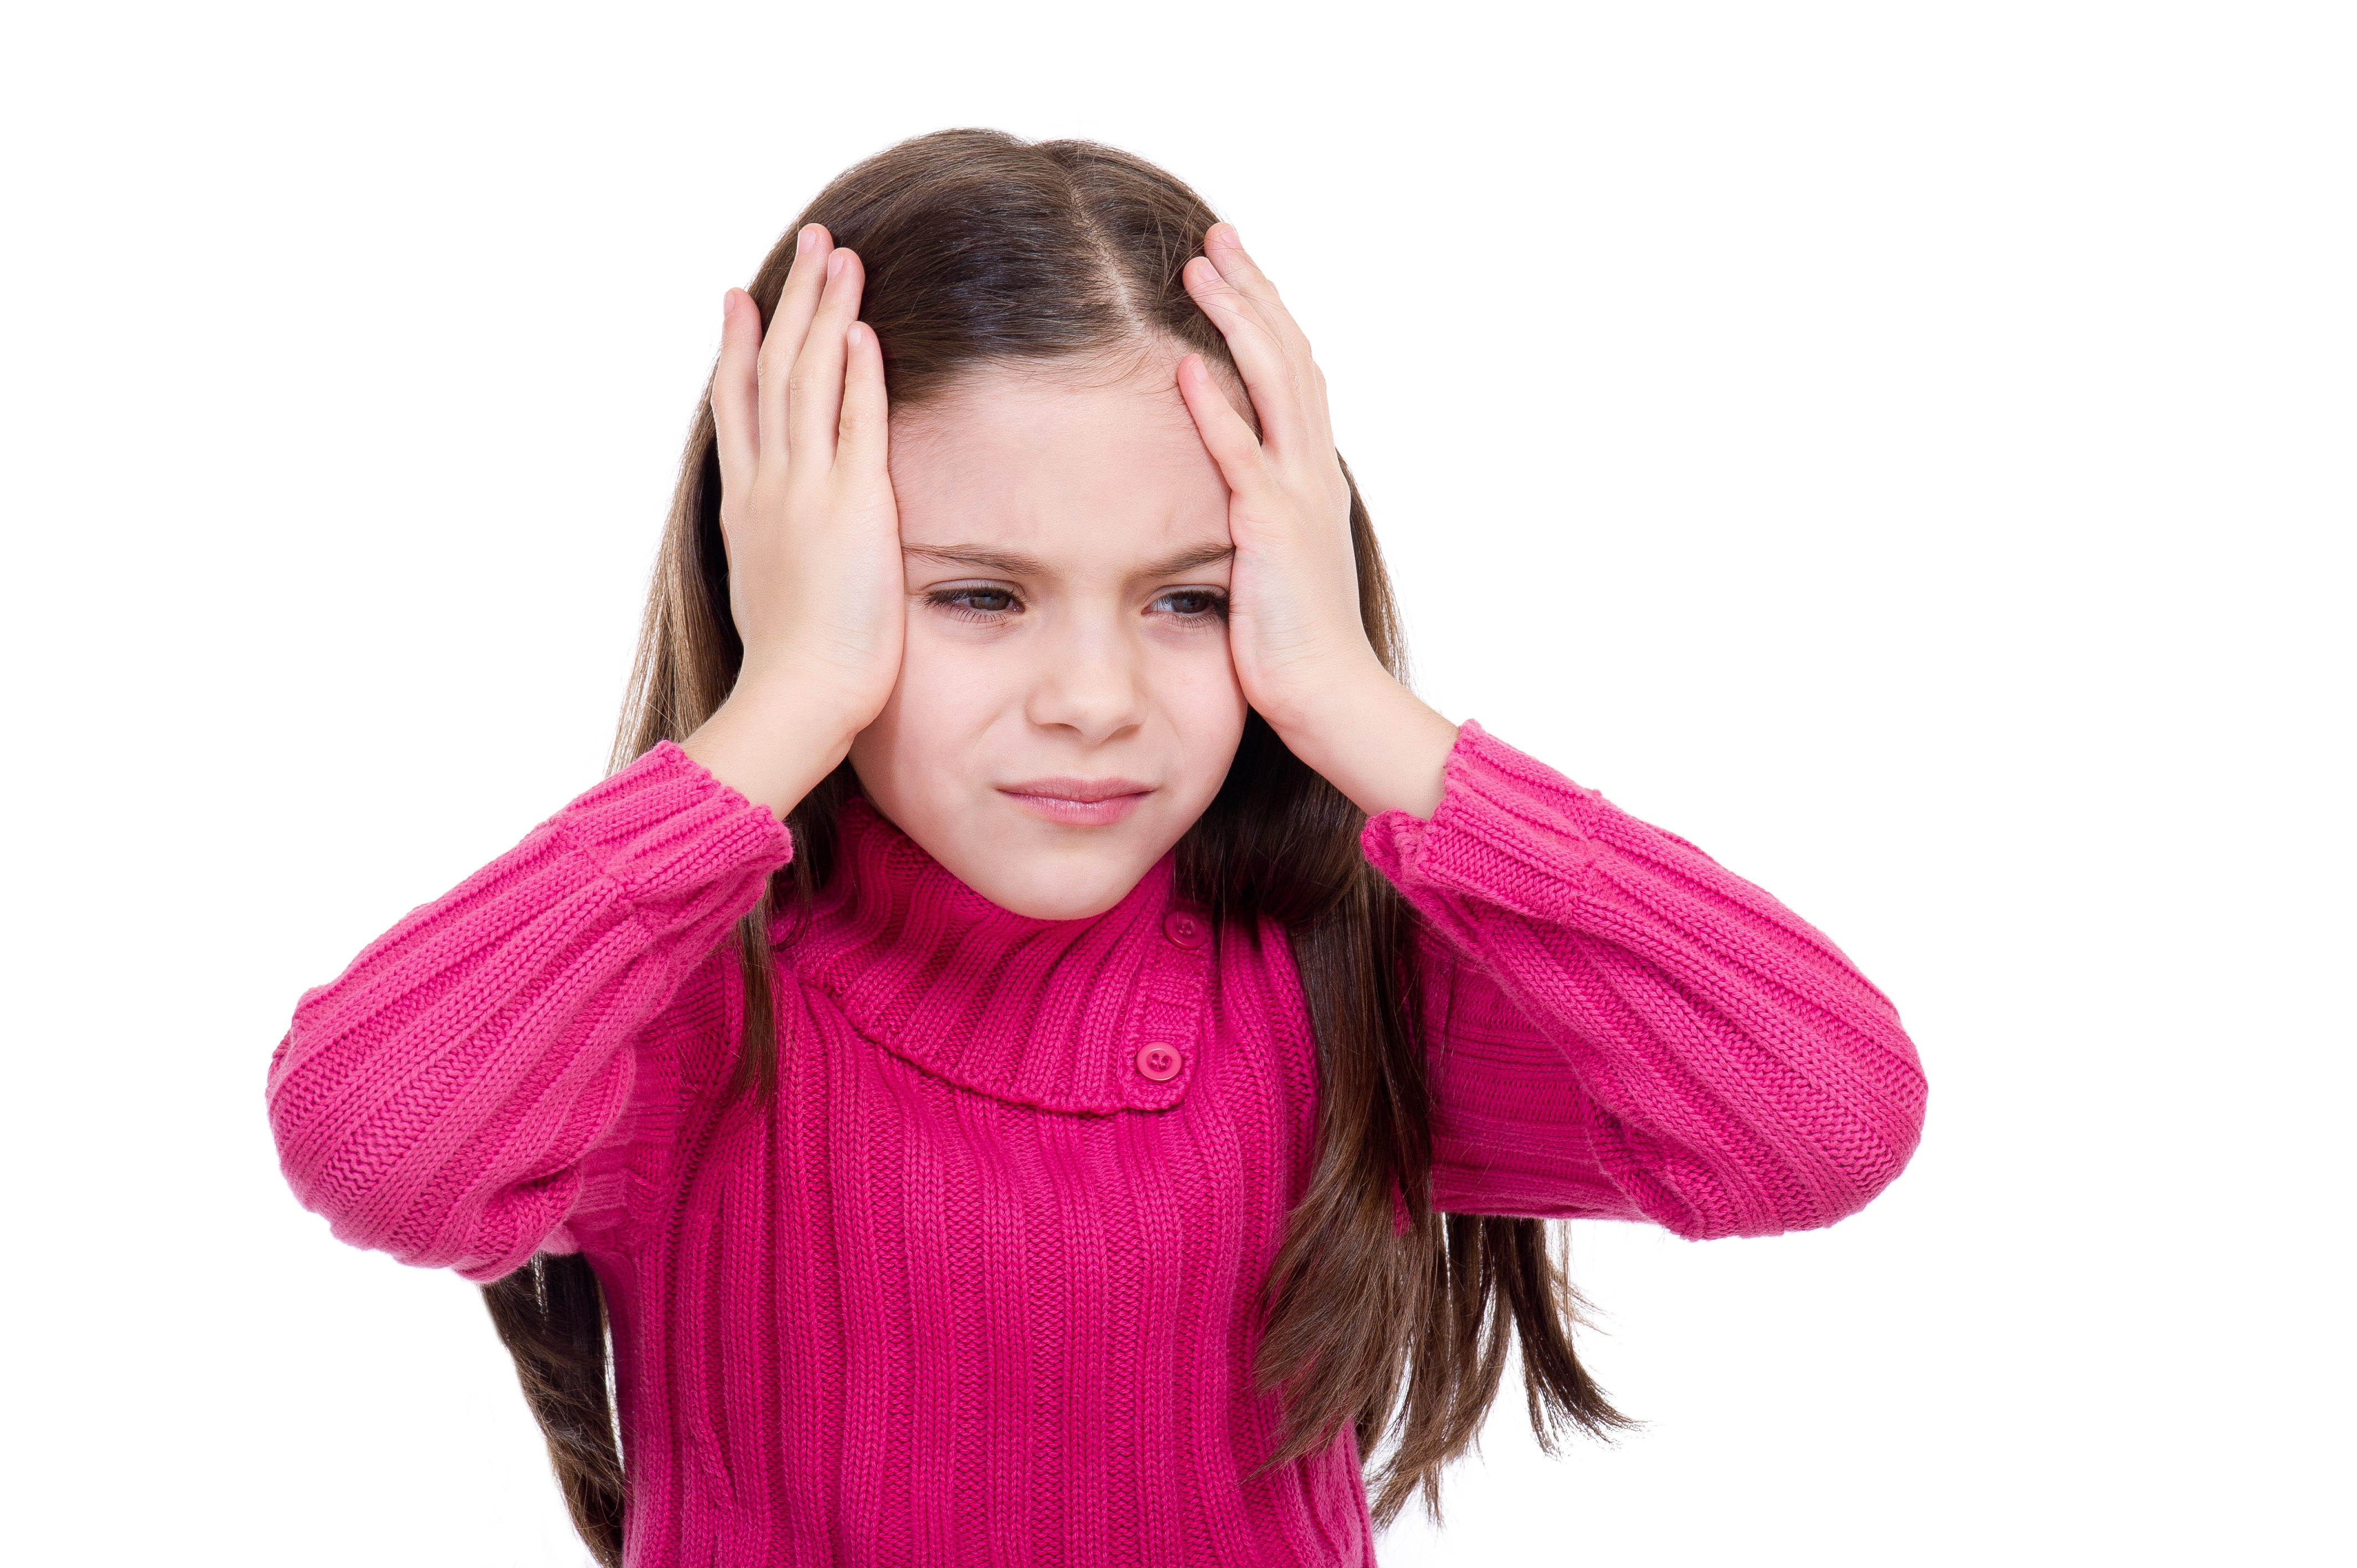 Headache Prevention and Wellness, Pediatric Neurology Headache Center - Broomfield, CO